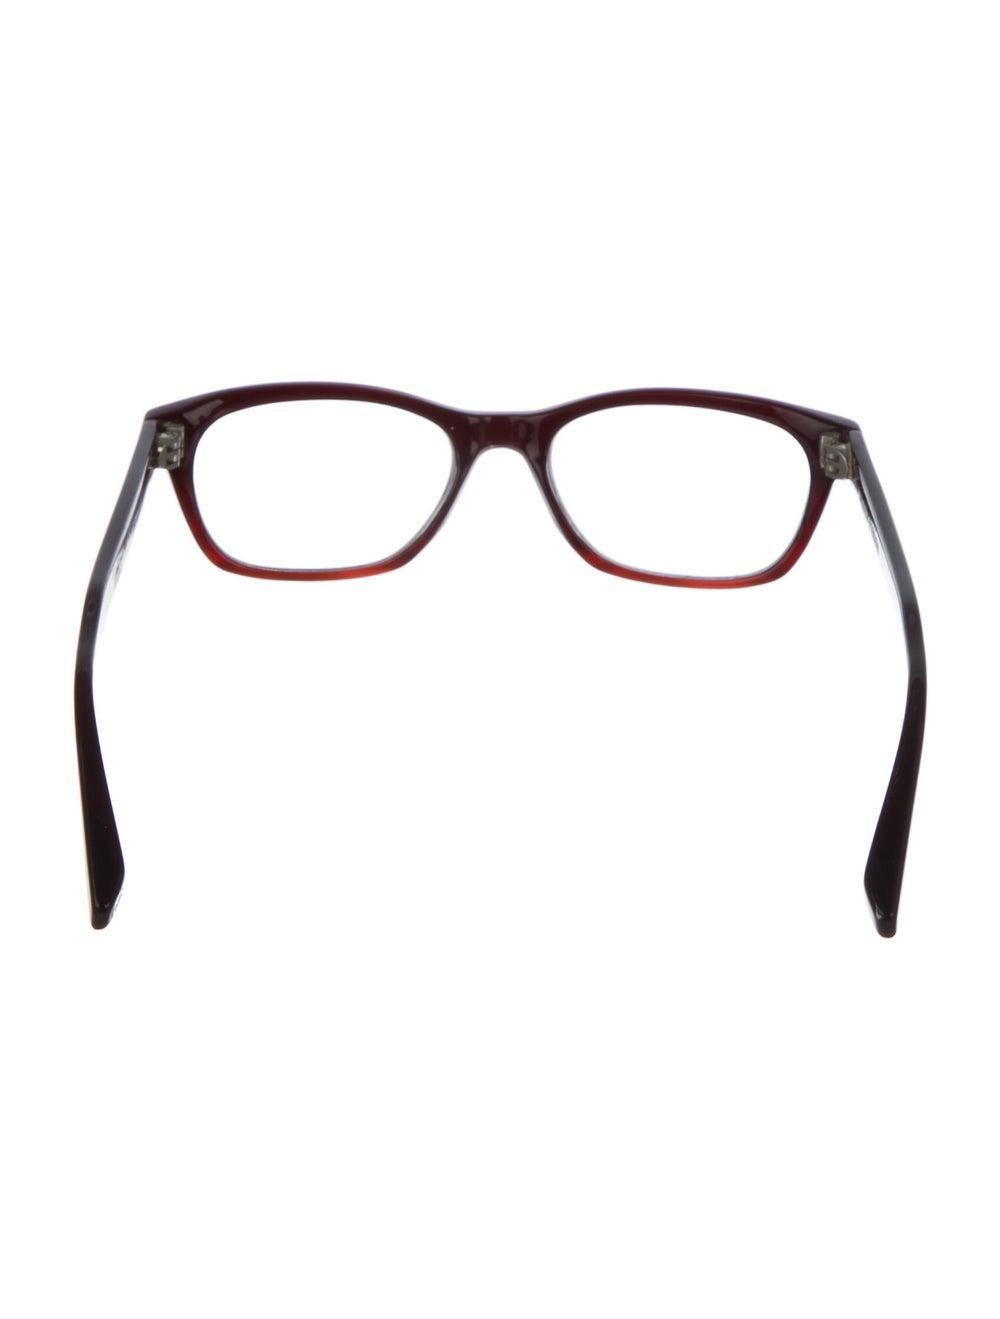 Warby Parker Square Eyeglasses Brown - image 3